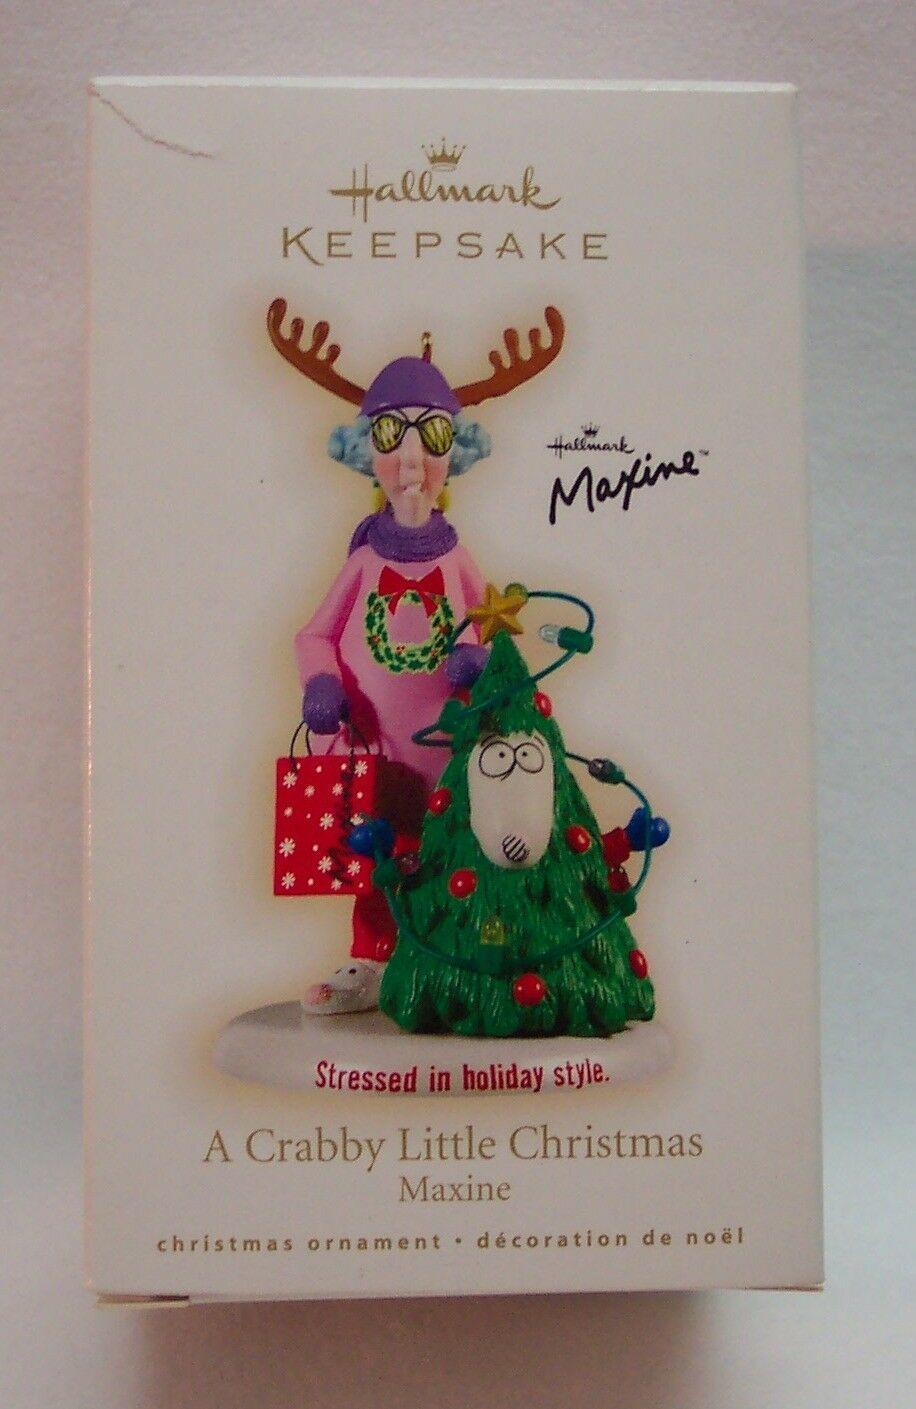 MAXINE A Crabby Little Christmas Hallmark Keepsake ...